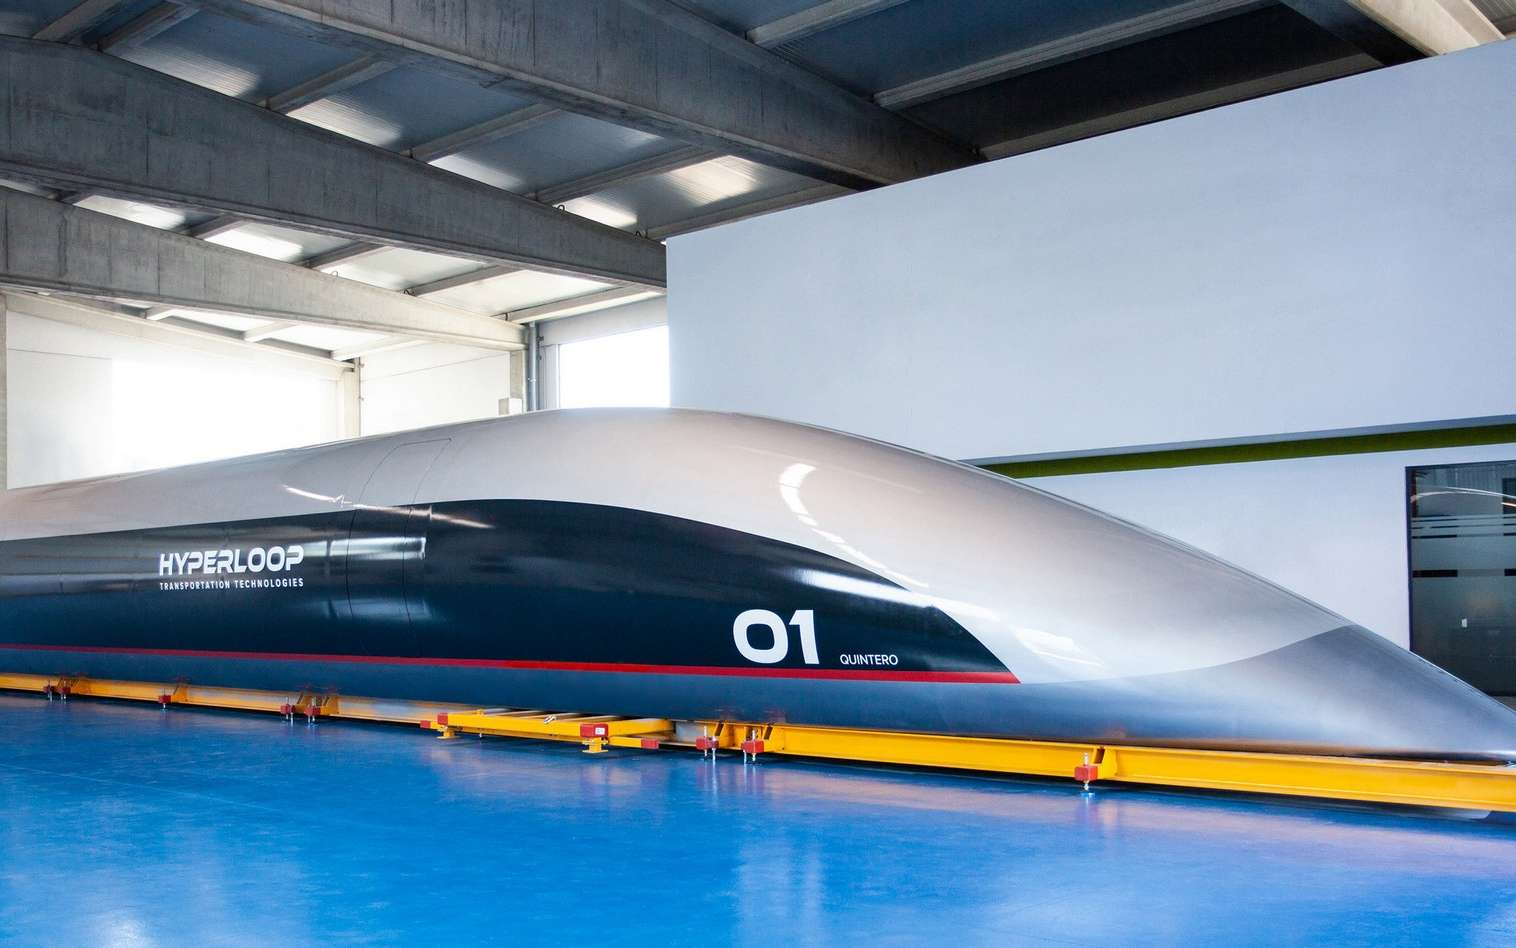 La capsule Hyperloop Quintero One. © HyperloopTT